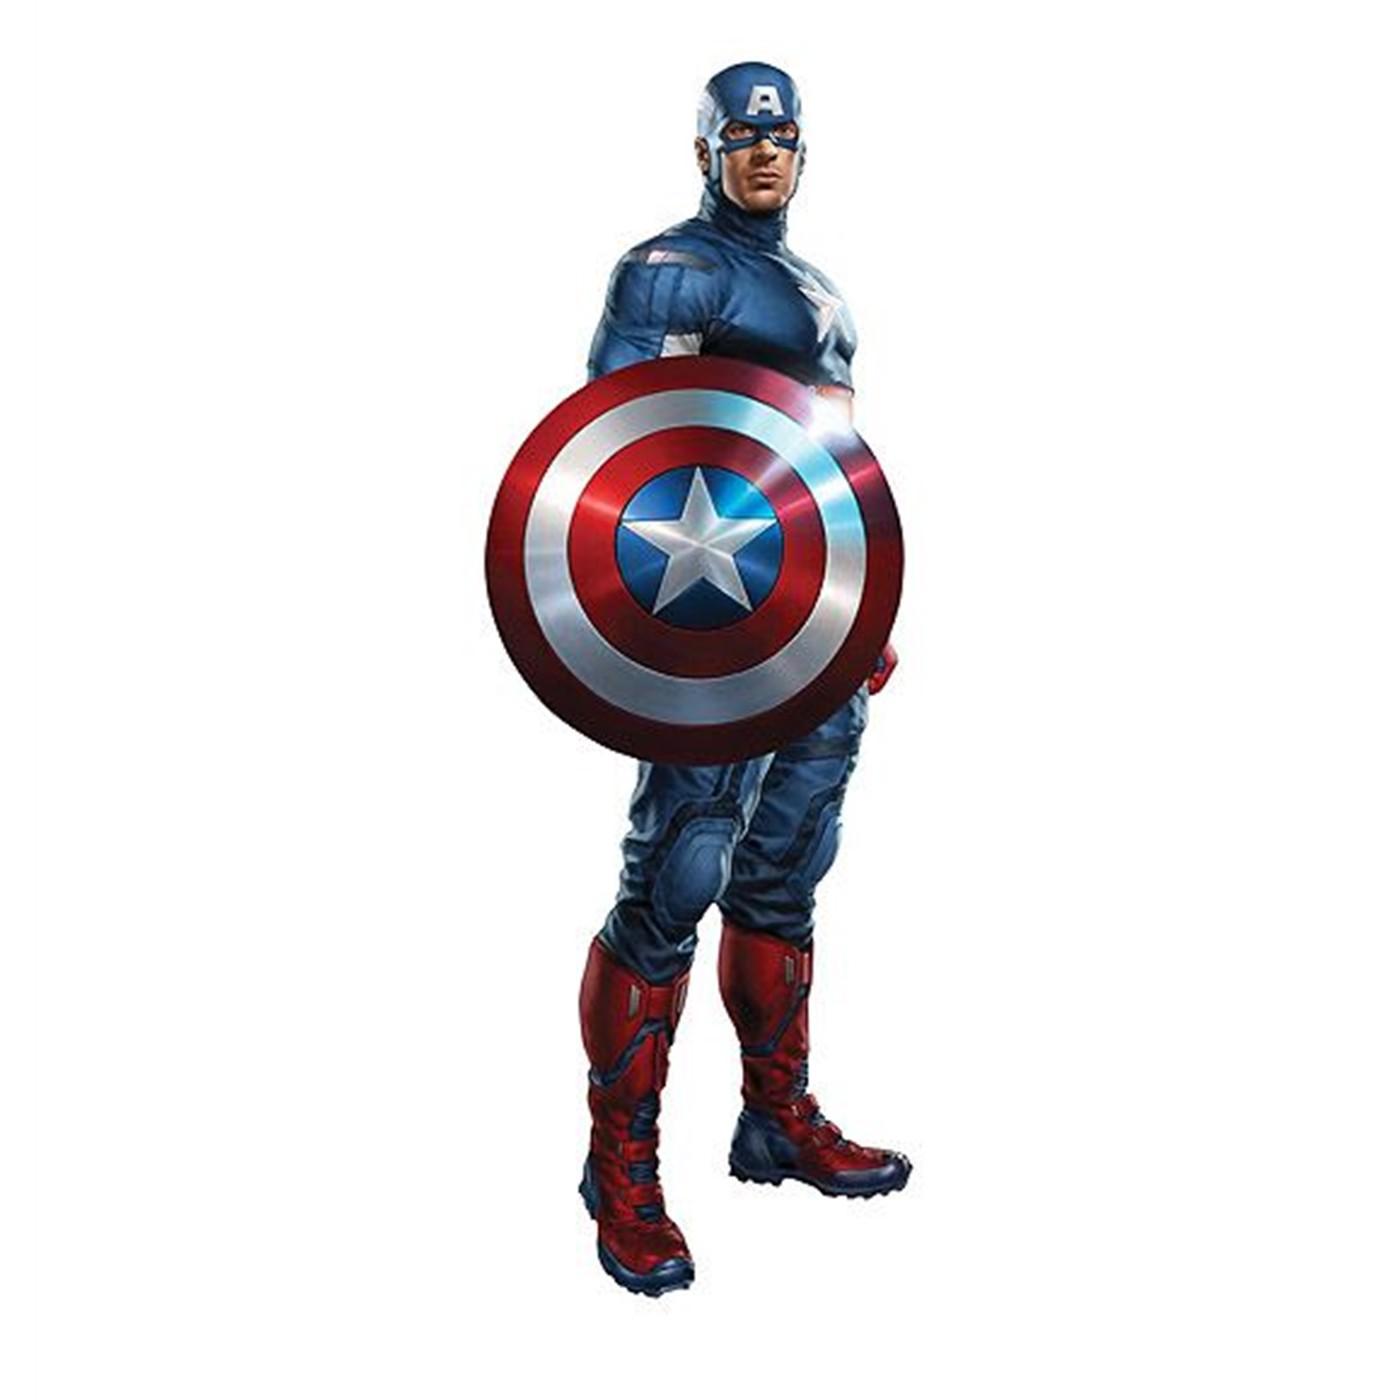 The Avengers Movie Captain America Cardboard Standup